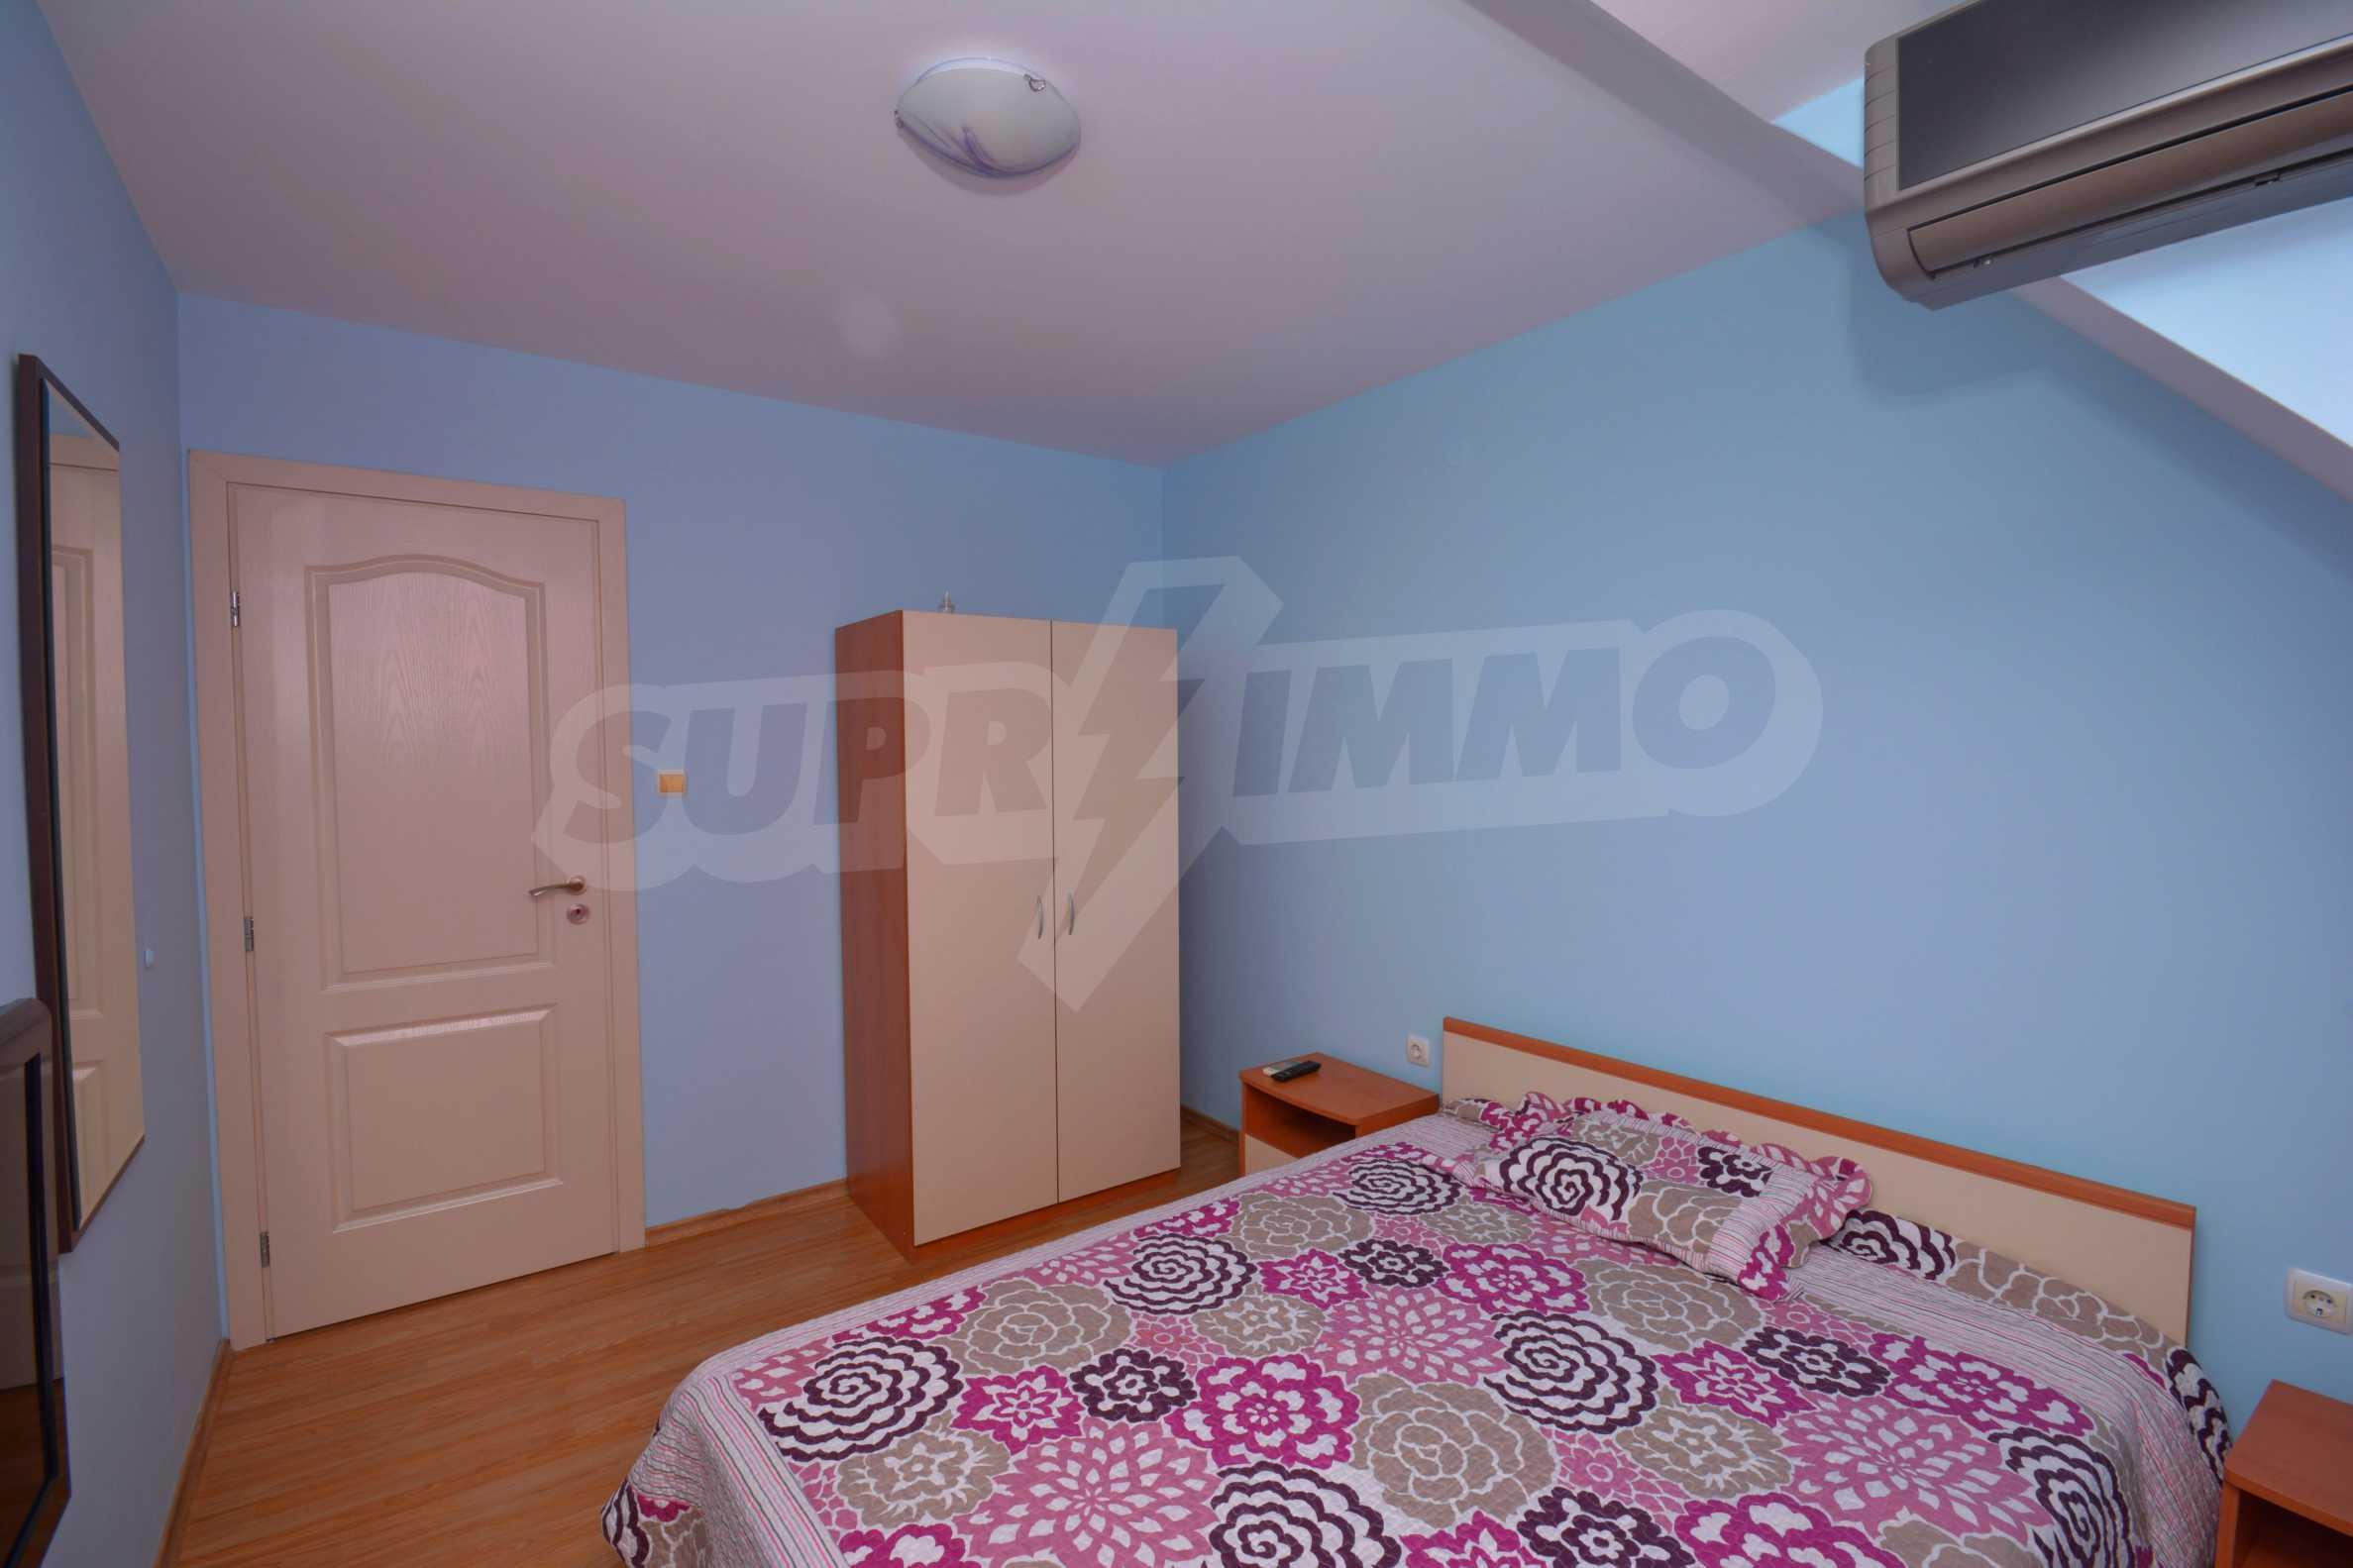 Многостаен апартамент до Гранд Хотел Пловдив 7